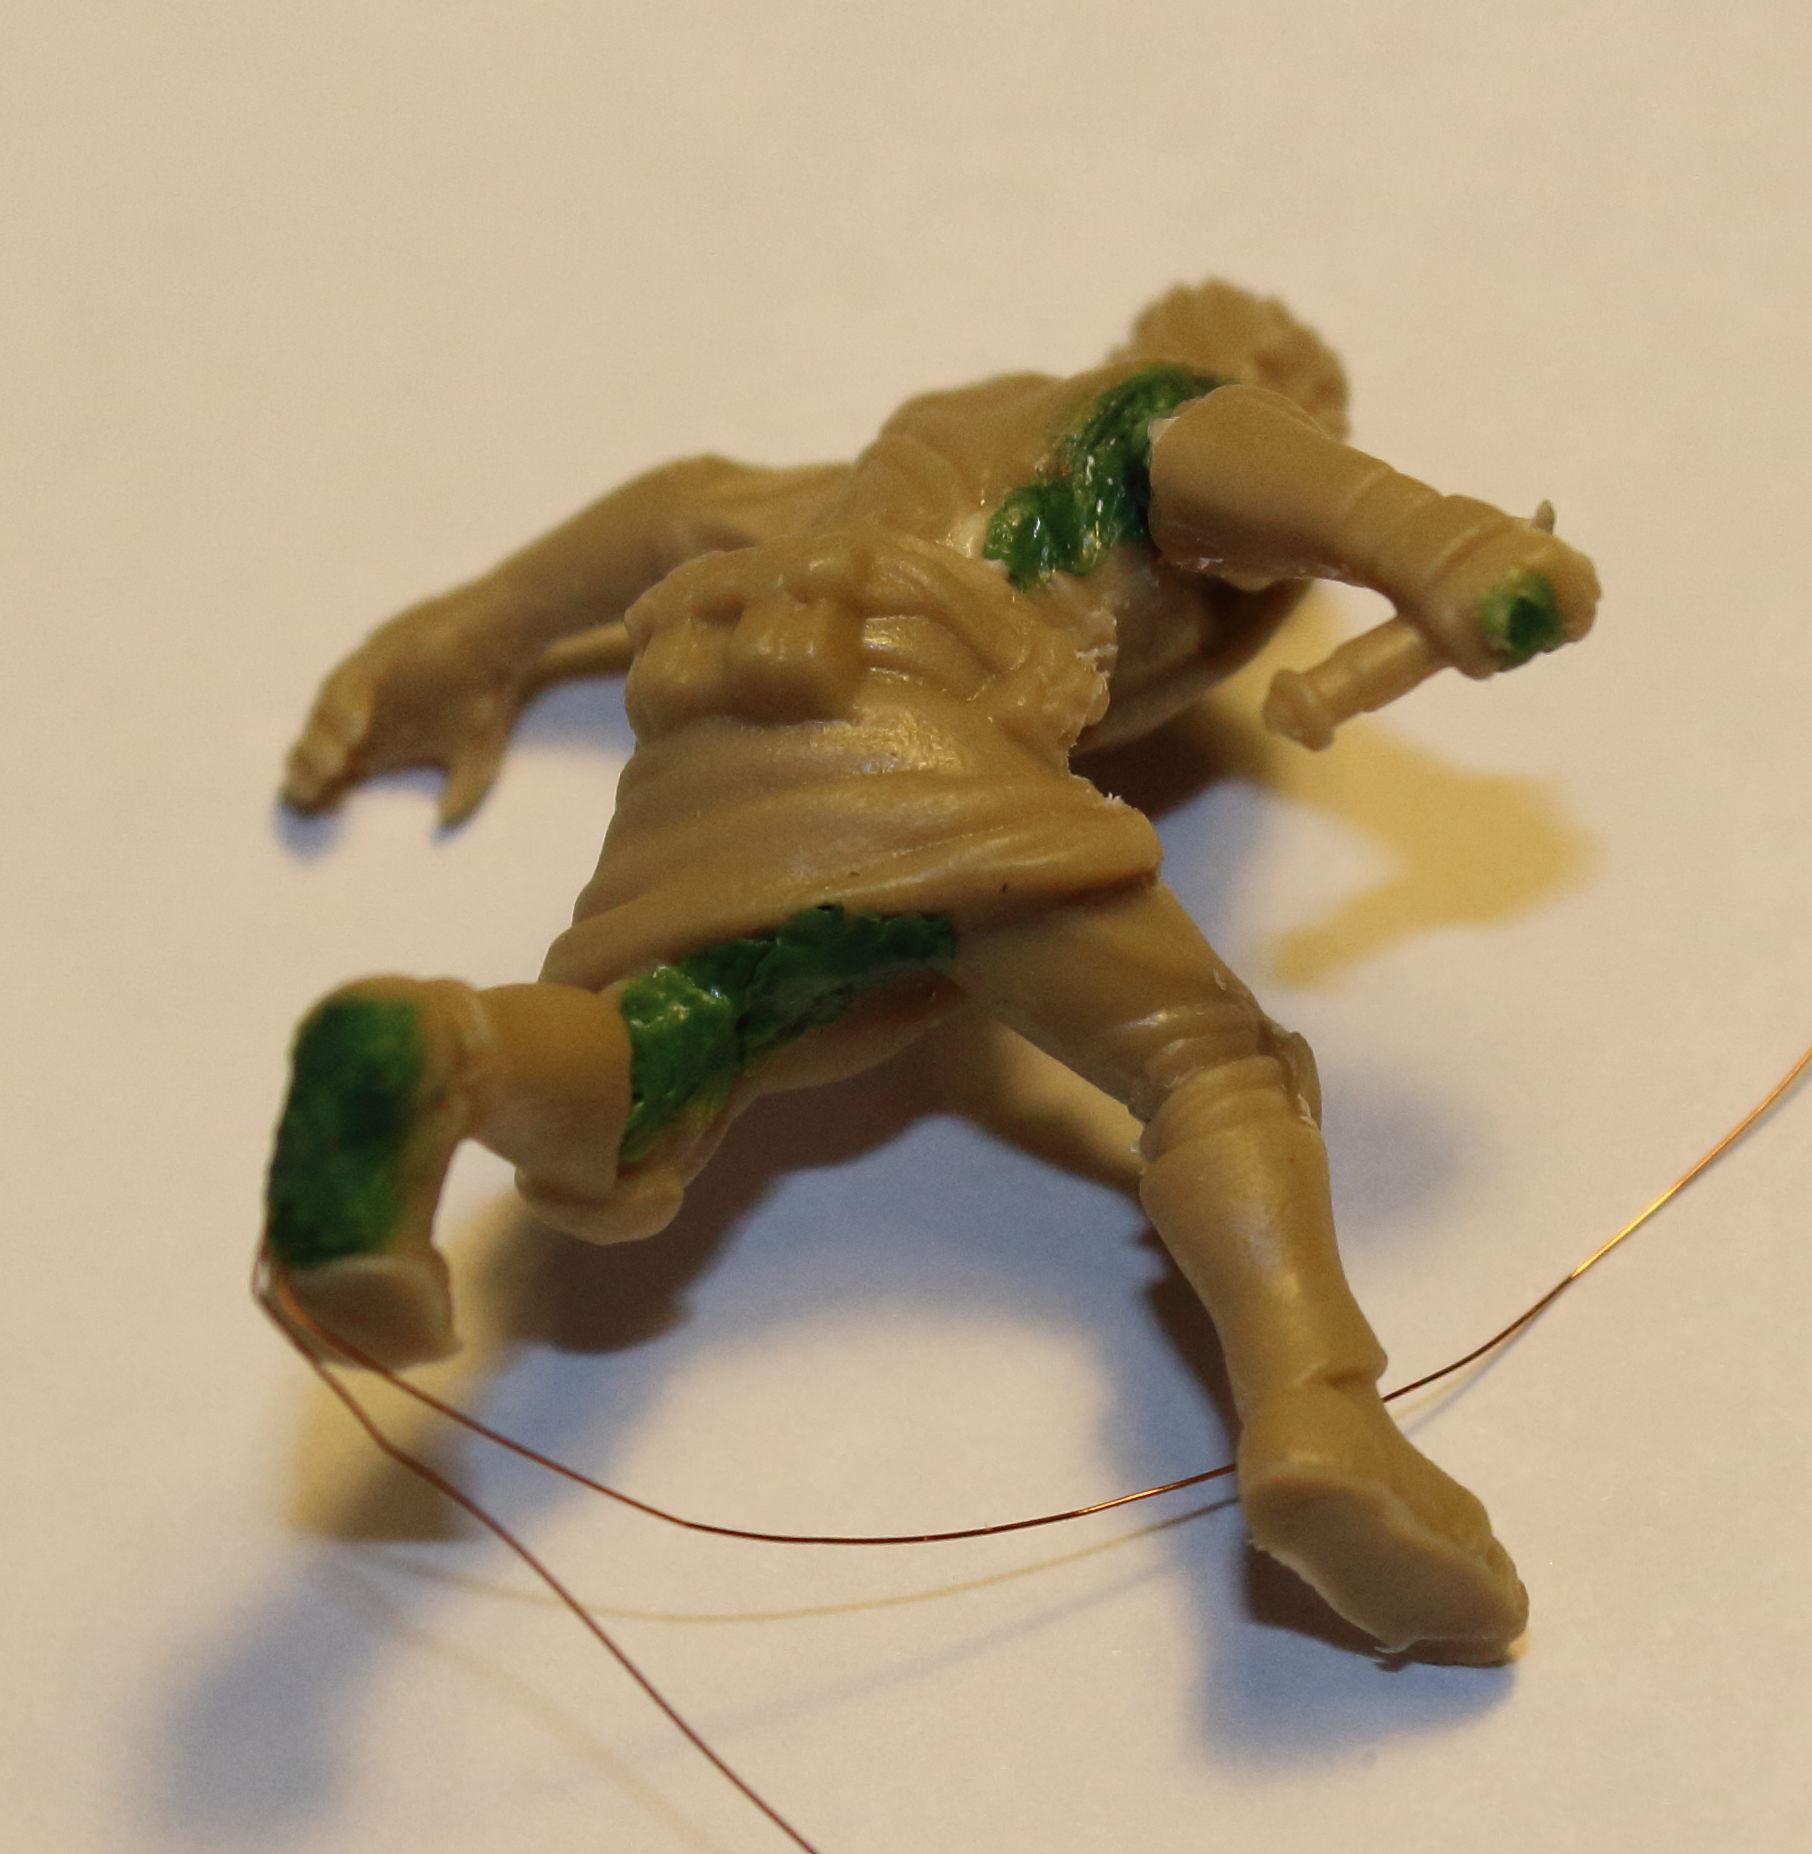 Imperial_Assault_Board_Game_LED_lightsaber_miniature_08.jpg